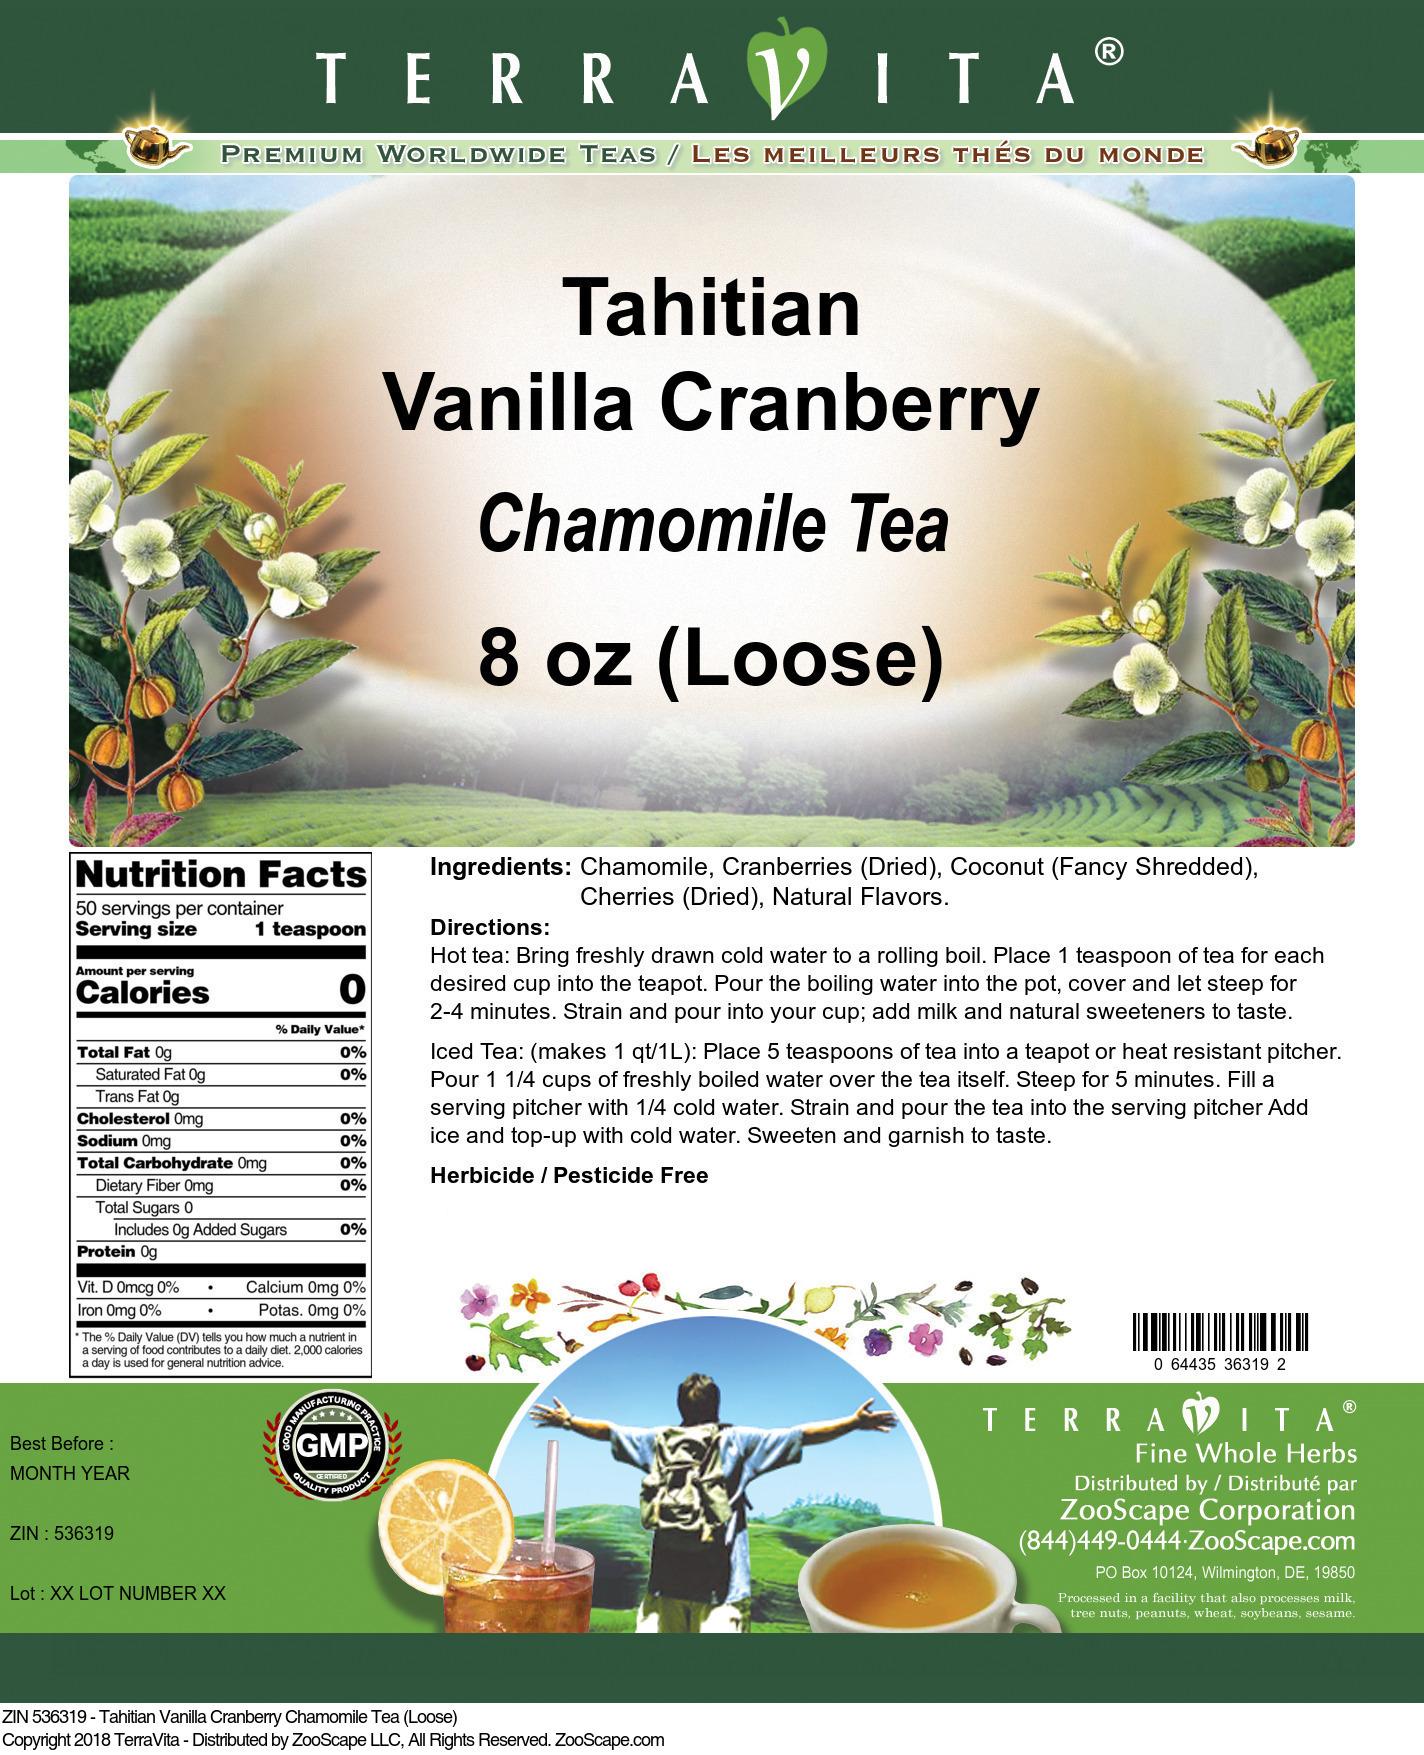 Tahitian Vanilla Cranberry Chamomile Tea (Loose)